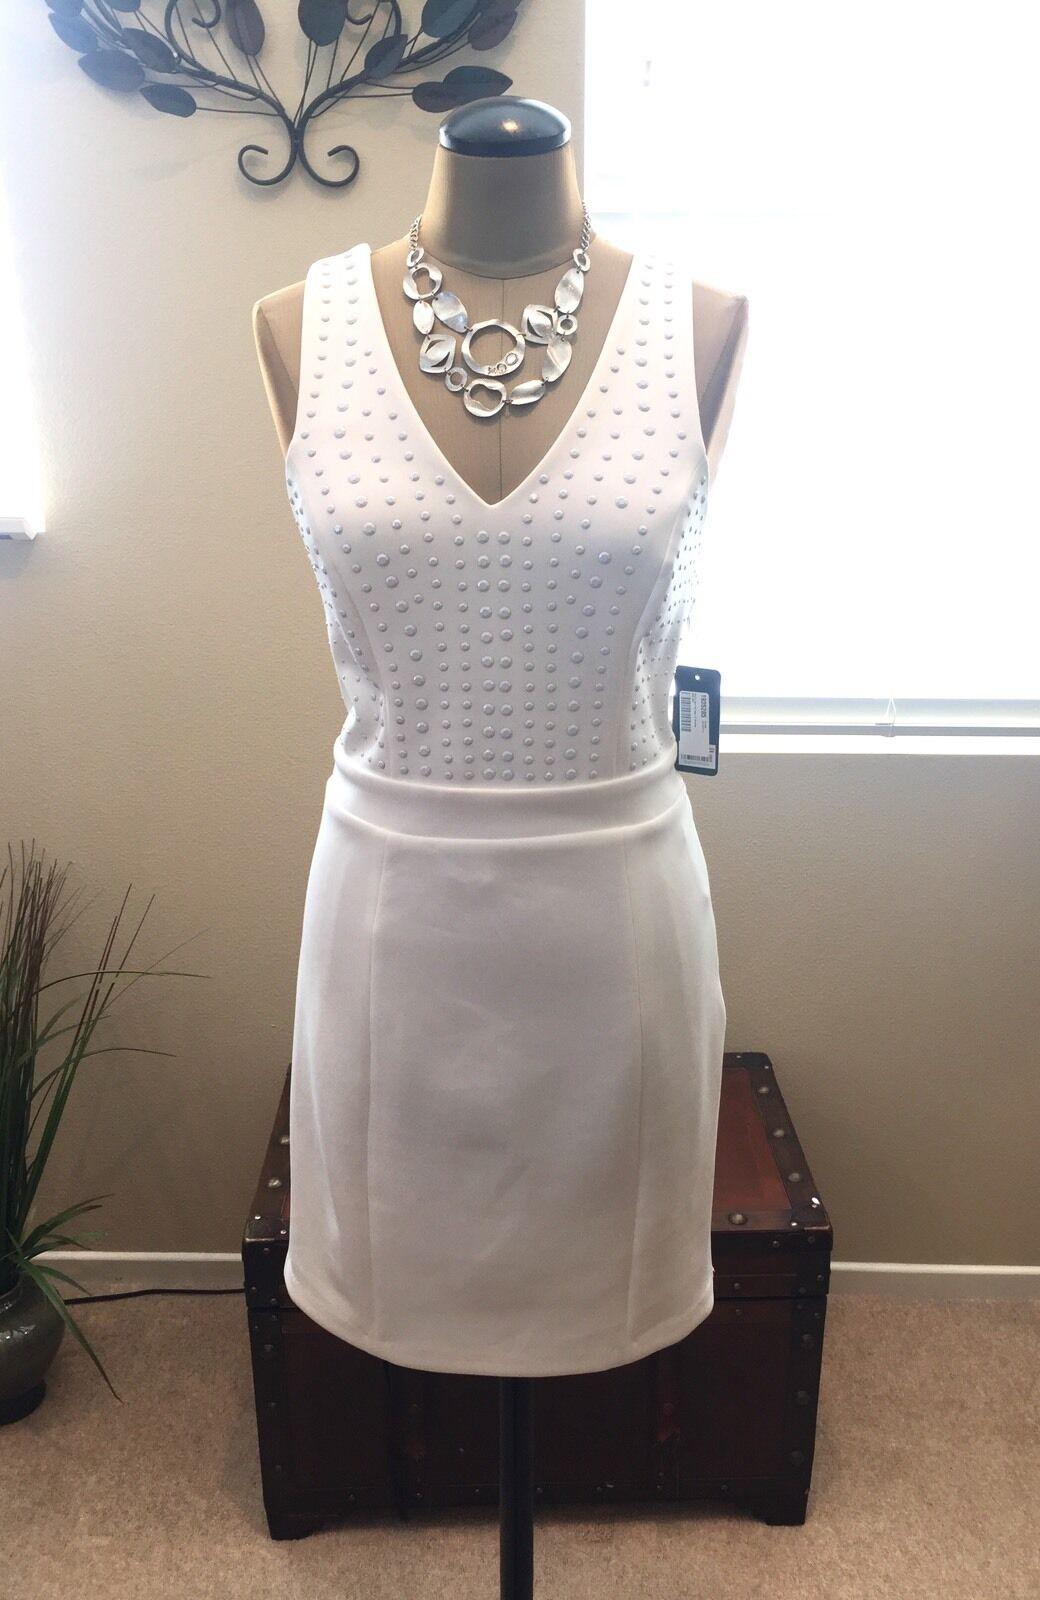 GUESS Shania White Embellished Sleeveless Dress Size 10. NWT NWT NWT Retail  128.00 b1a3a2